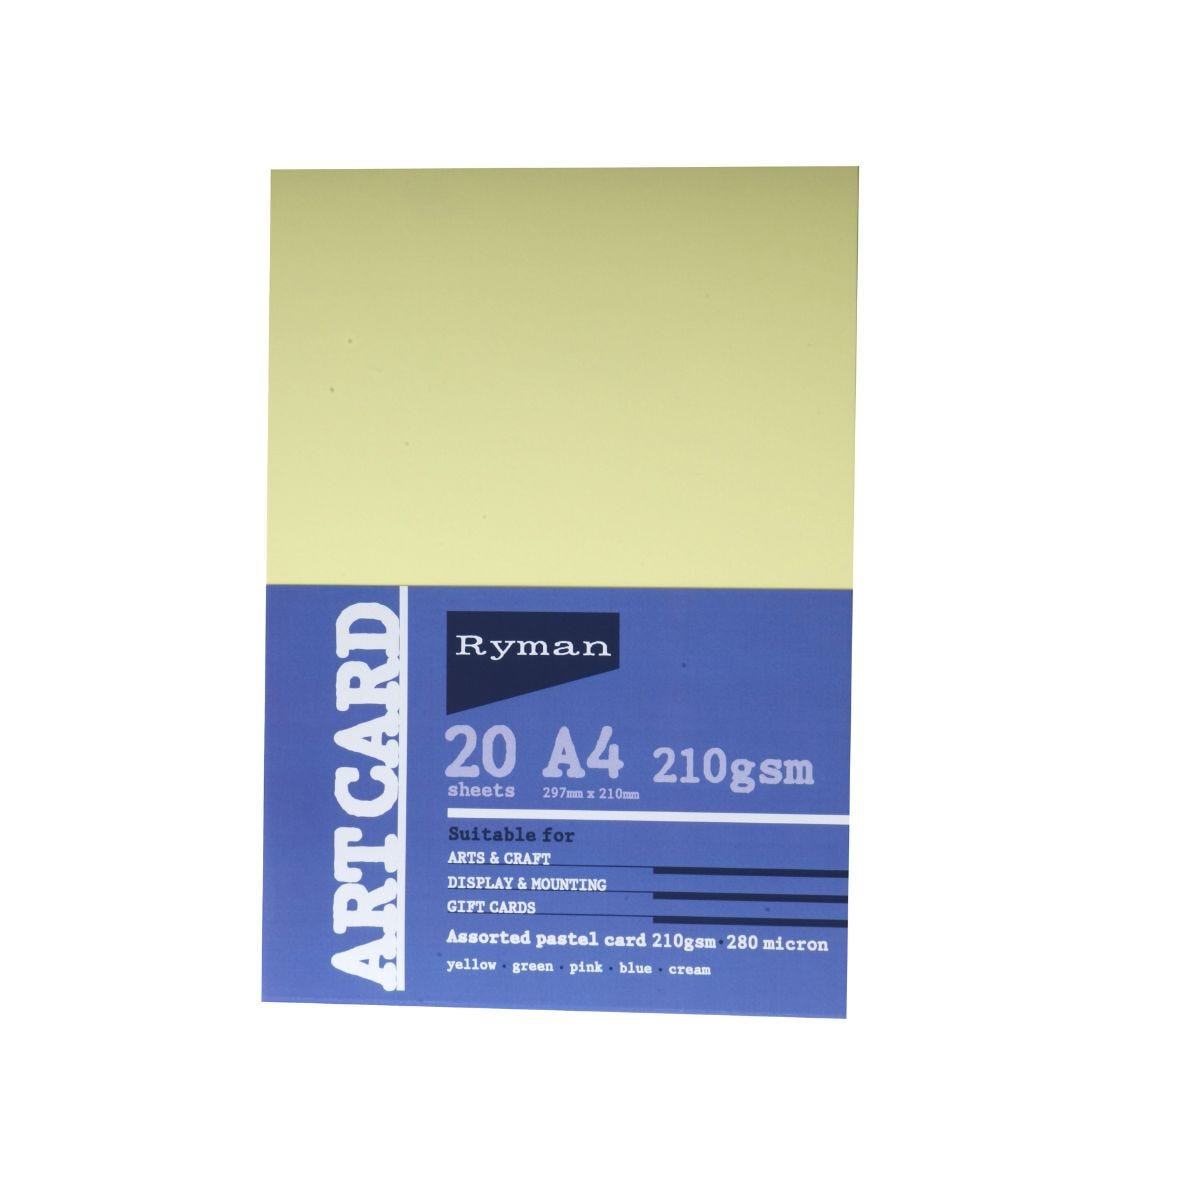 Ryman Art Card A4 210gsm 20 Sheets, Pastel